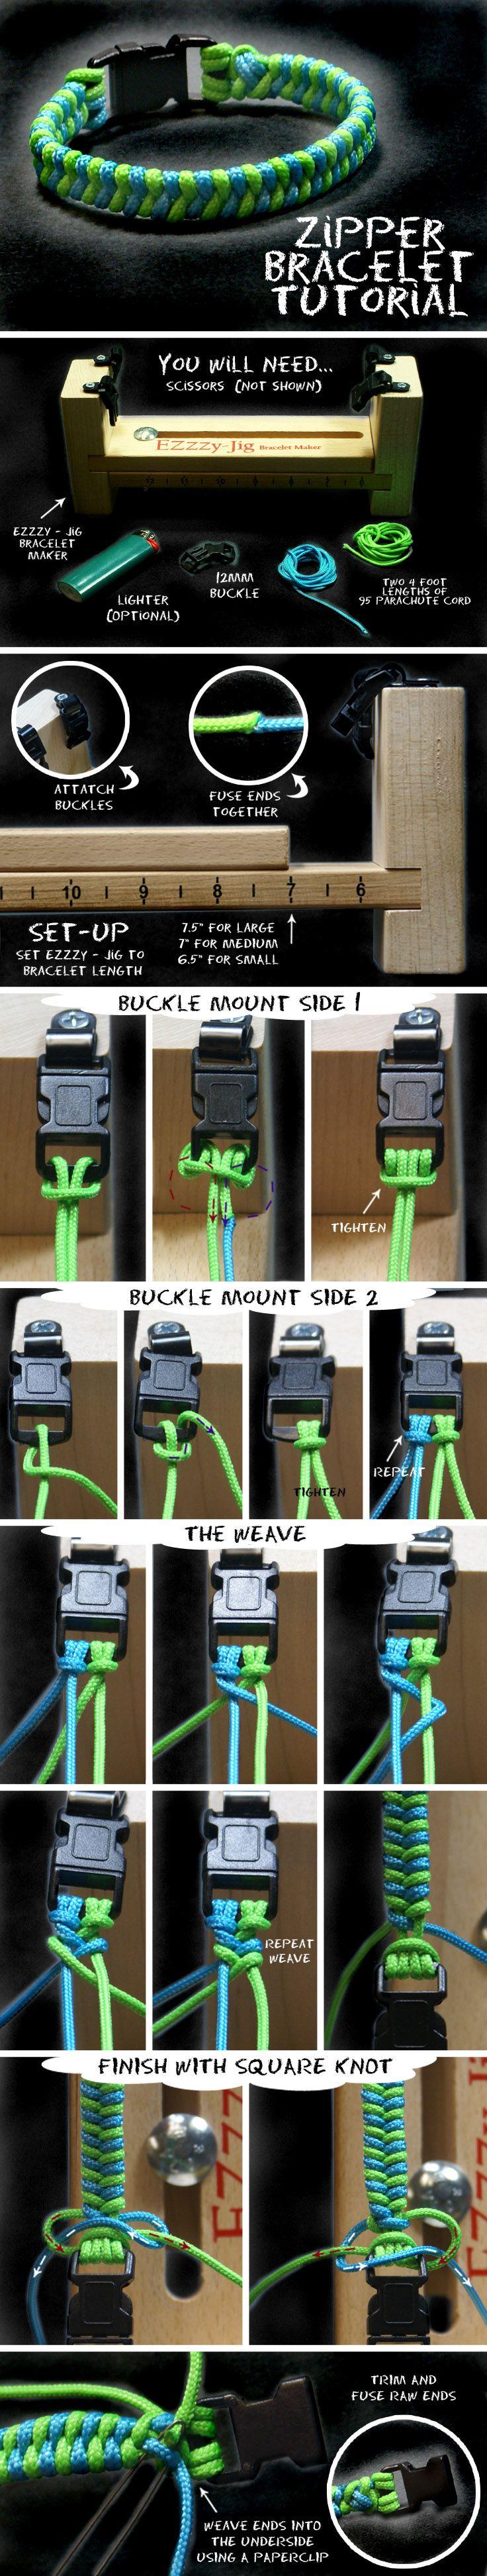 DIY Paracord Zipper Bracelet Jewelry